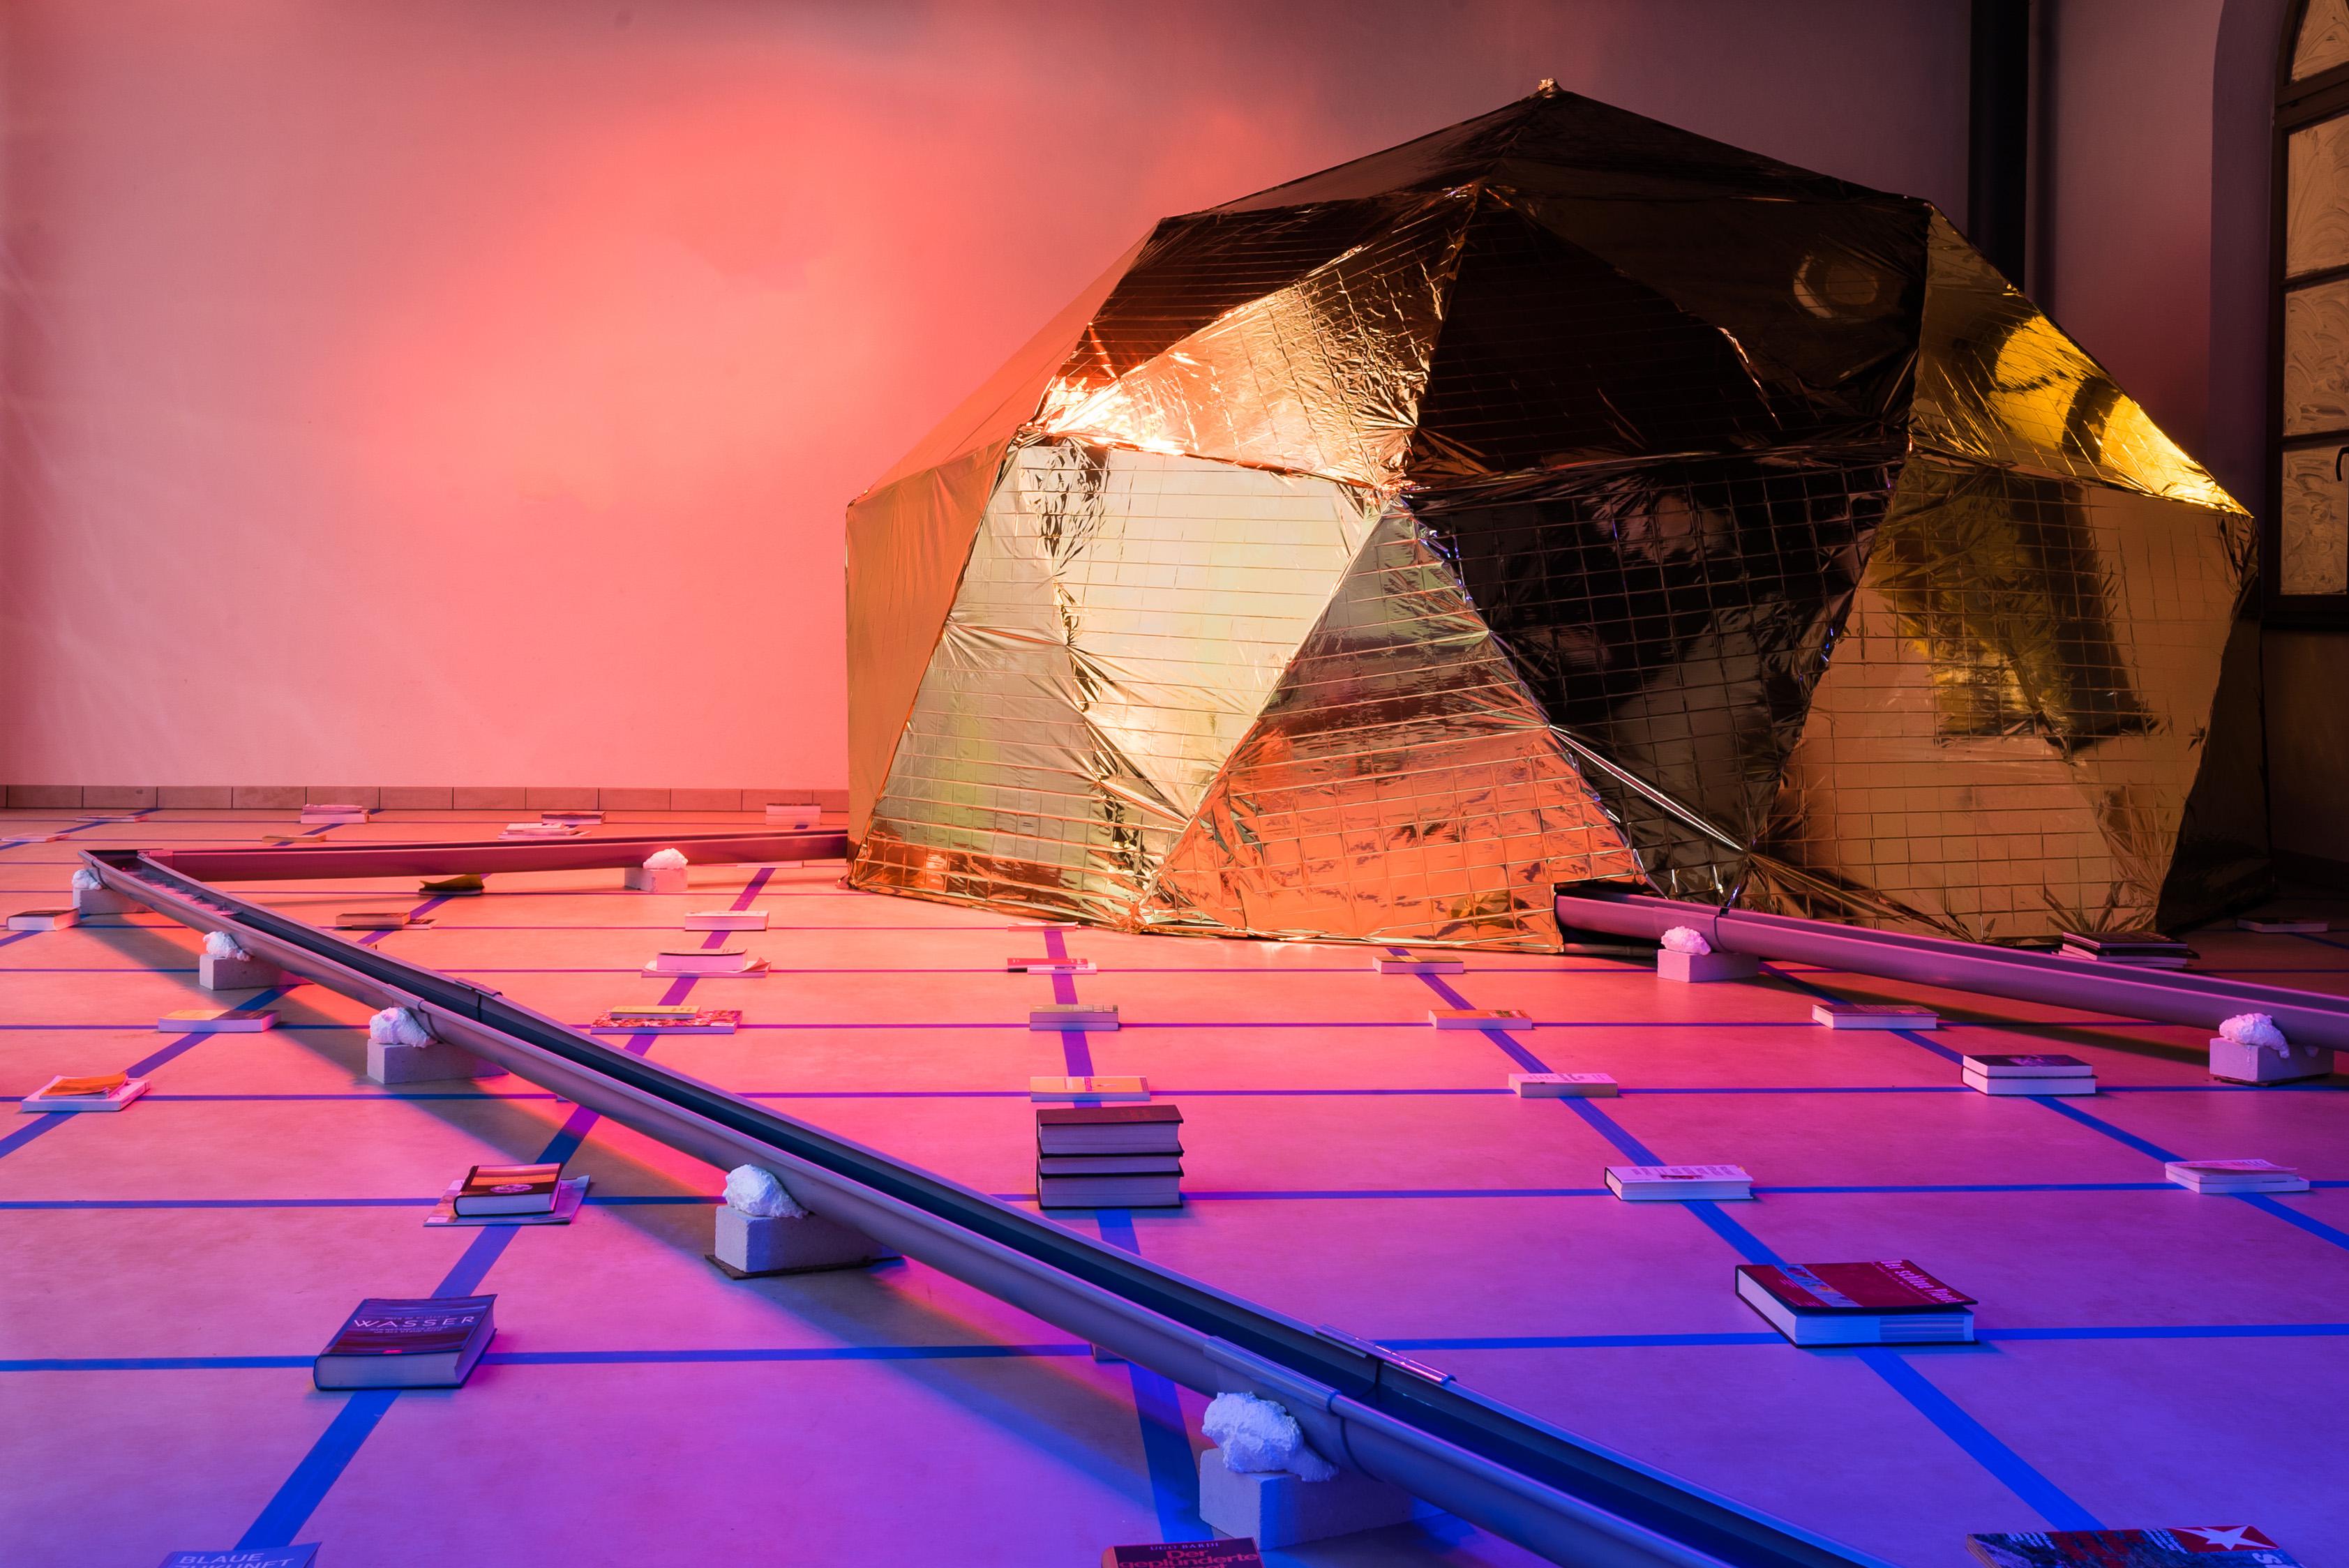 Apocalypse A_AP @Biennale Halberstadt 2018, Marius Förster, Jacqueline Hen, Installation Art, Geodestic Dome, Temporary Libary